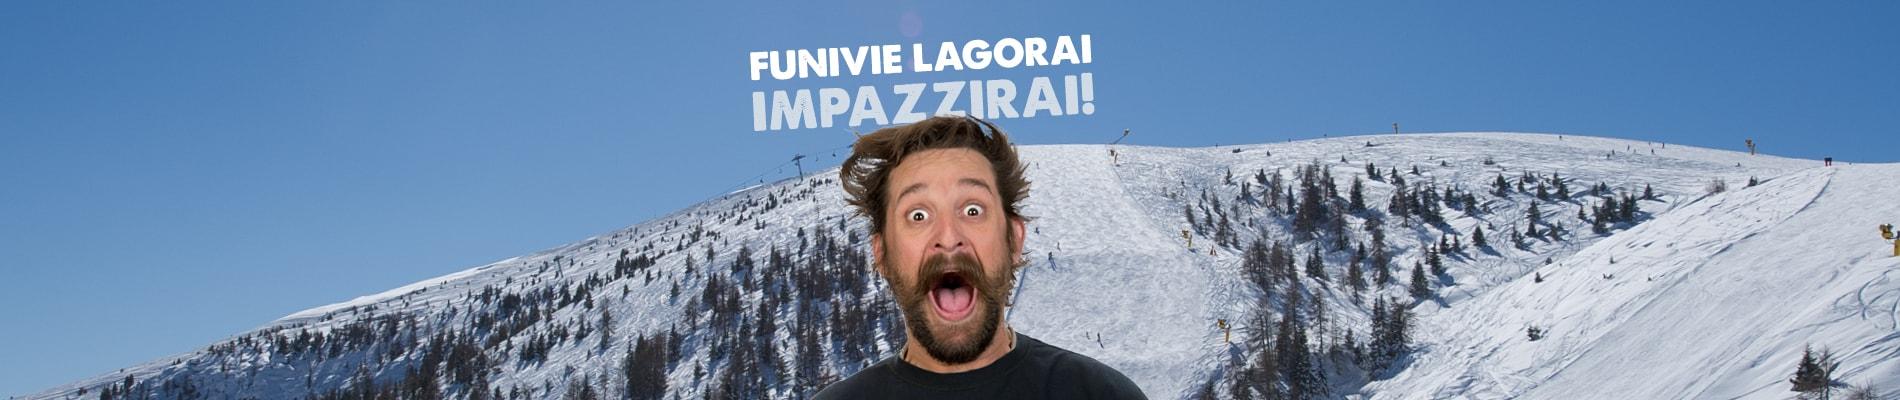 banner Funivie Lagorai